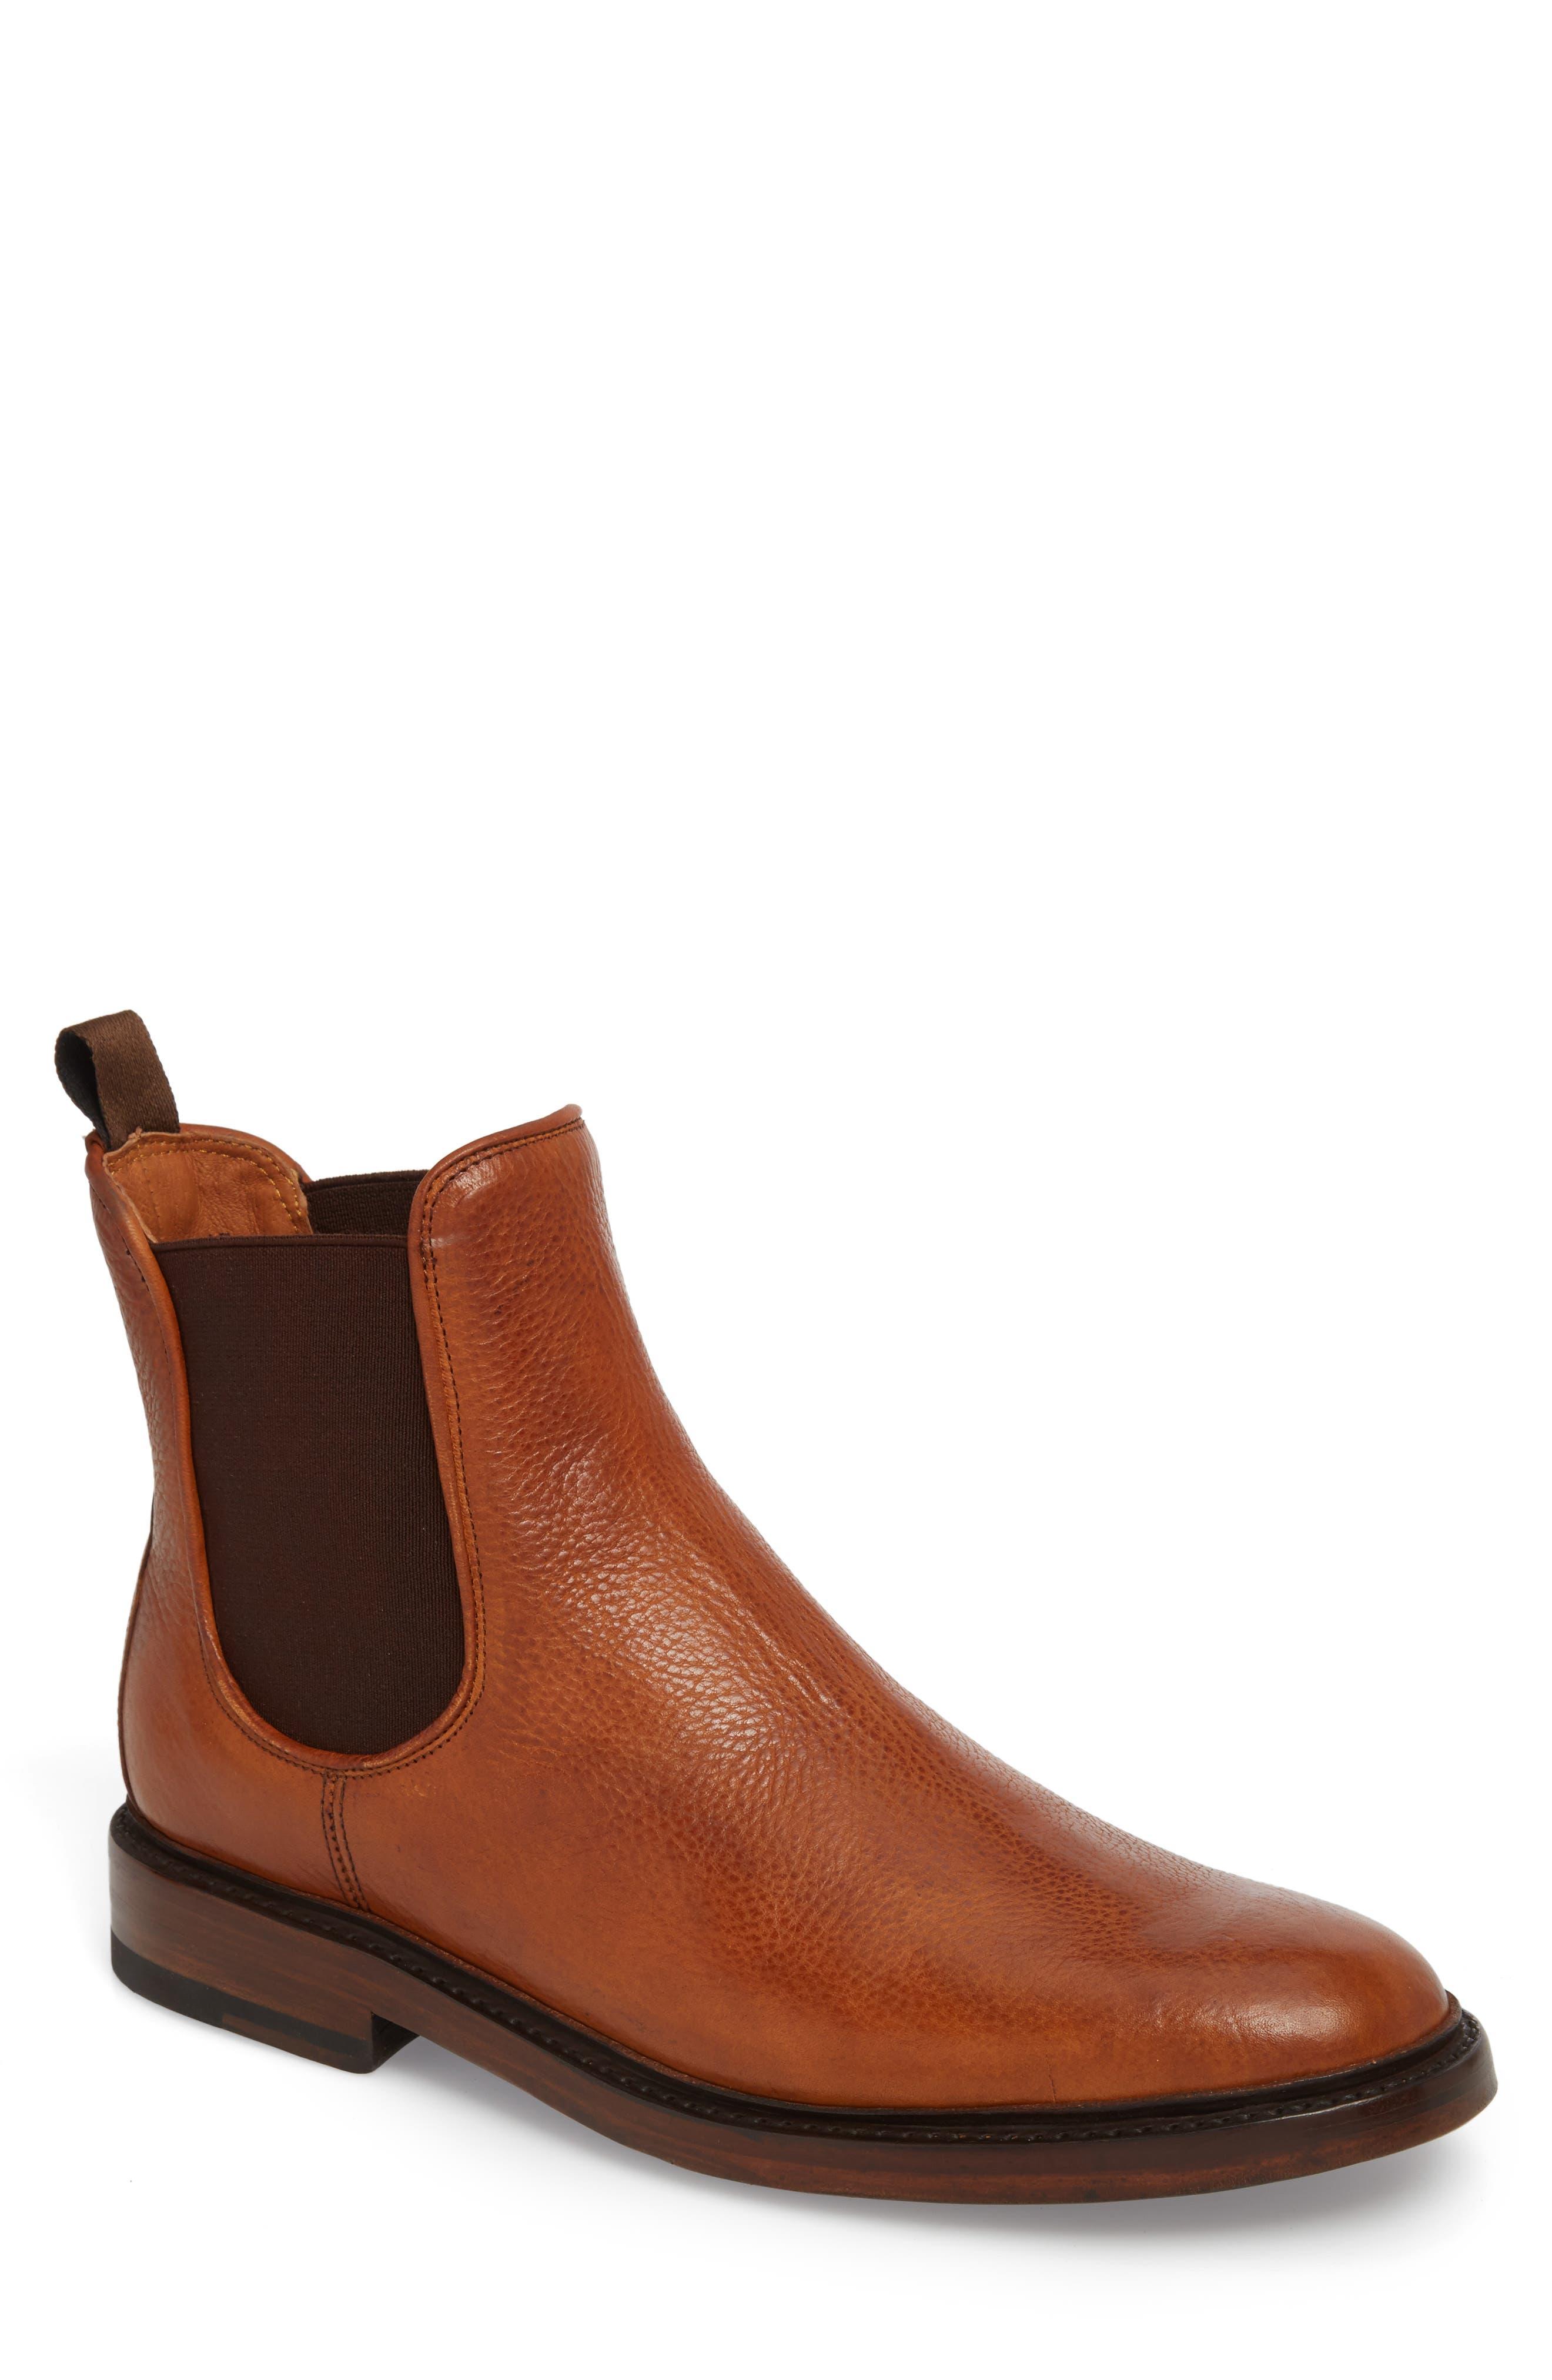 Jones Chelsea Boot,                             Main thumbnail 1, color,                             Caramel Leather